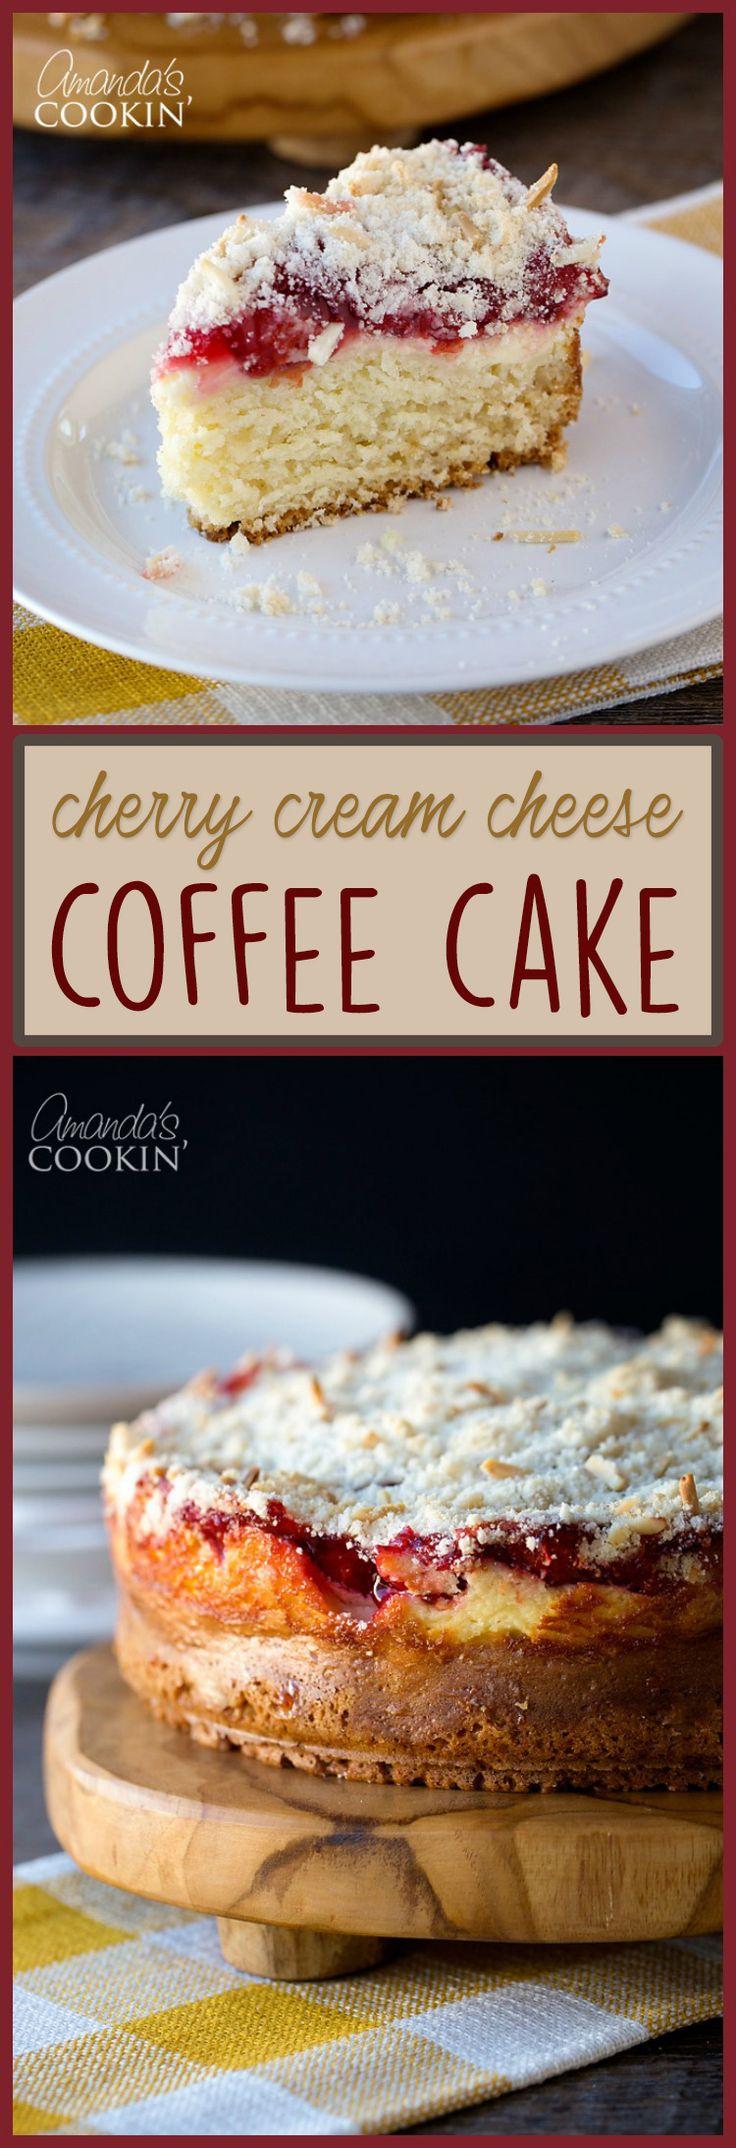 Best 25 Cherry coffee cakes ideas on Pinterest  Cherry desserts